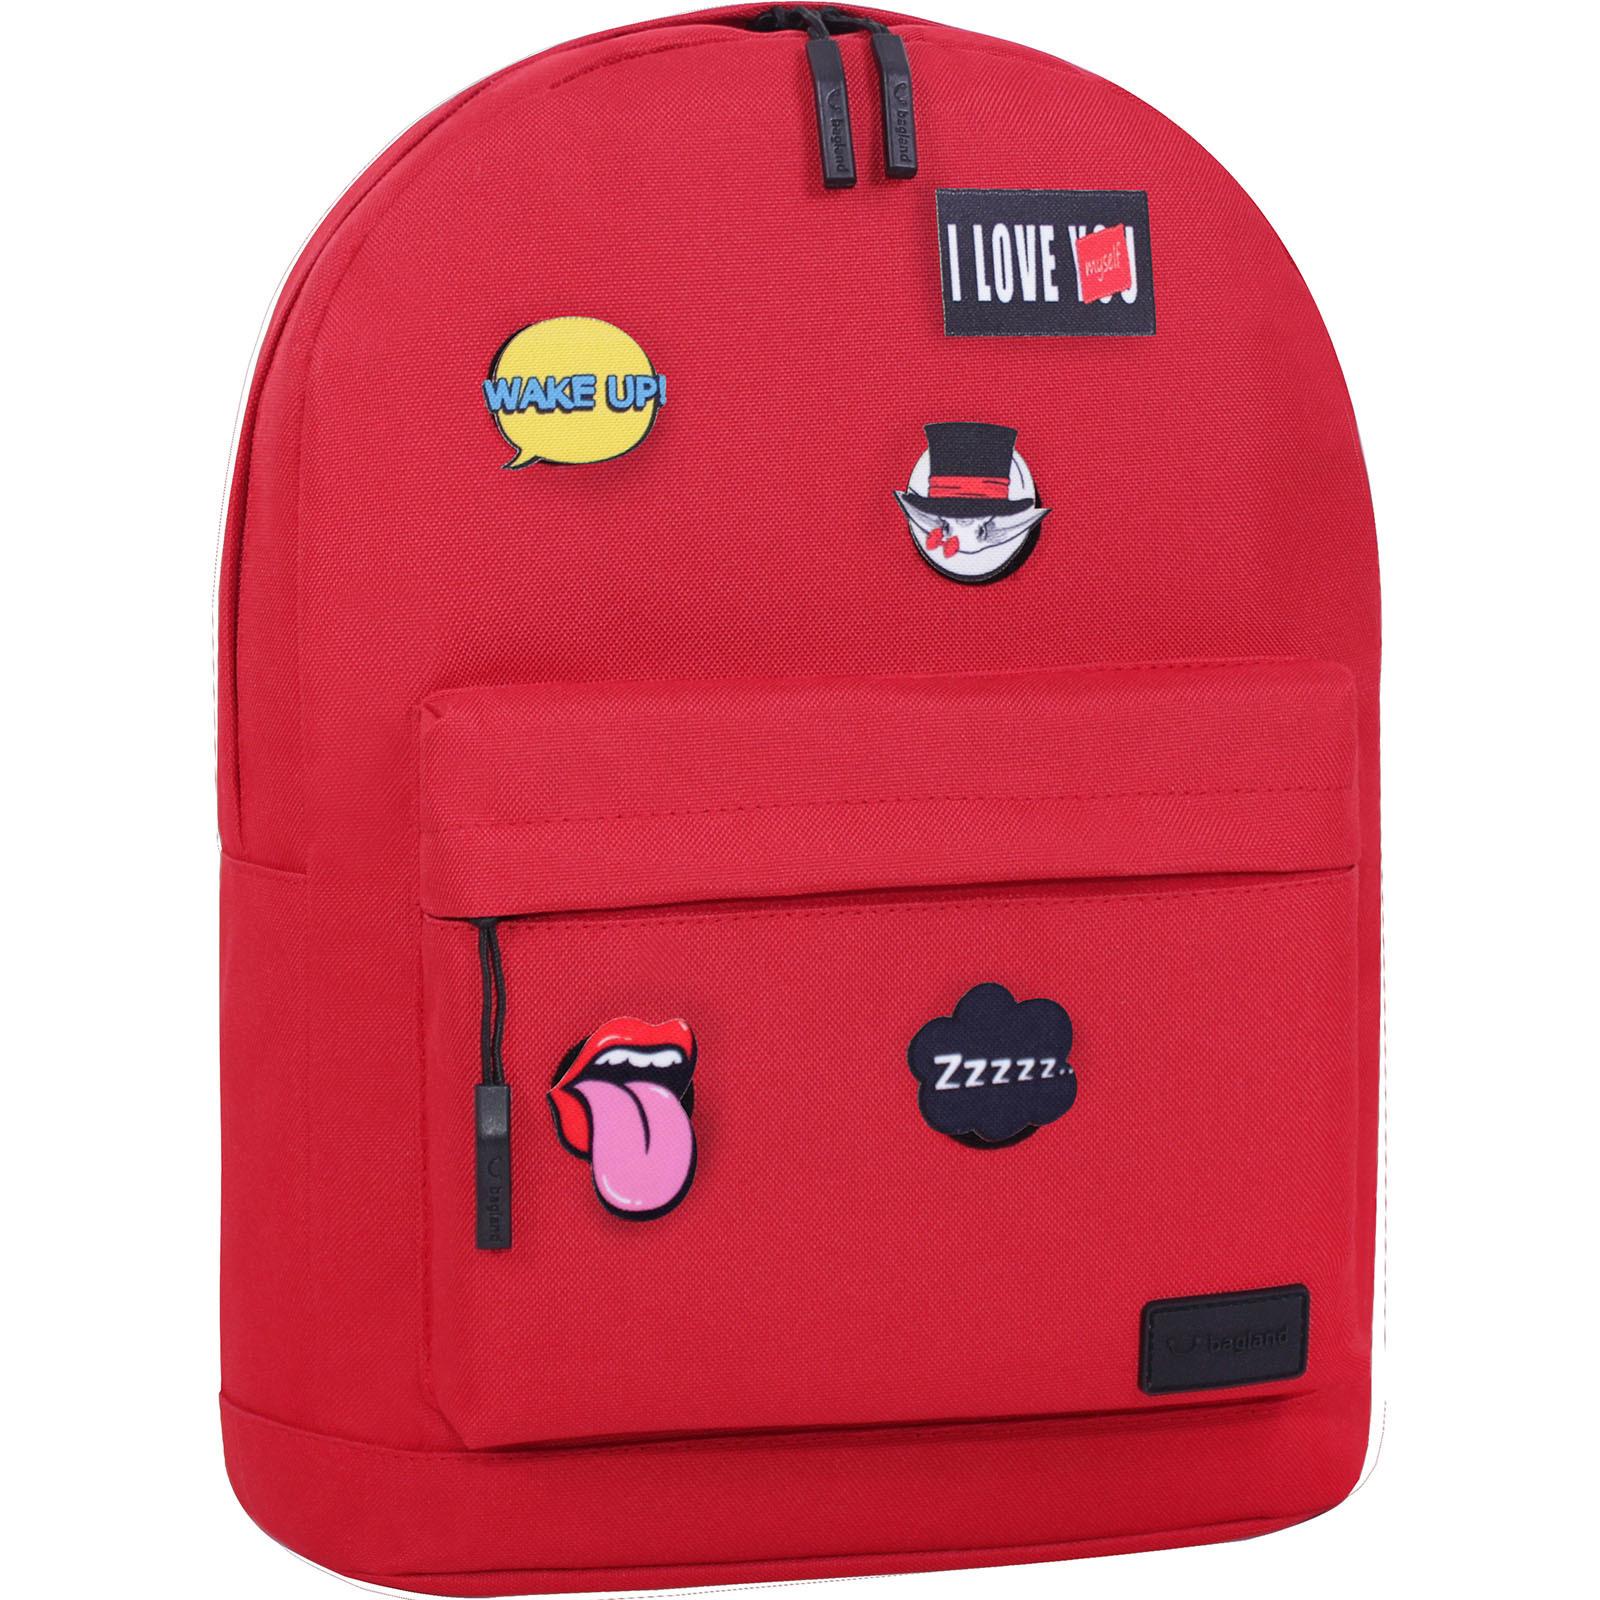 Молодежные рюкзаки Рюкзак Bagland Молодежный W/R 17 л. 148 красный (00533662 Ш) IMG_2959.JPG